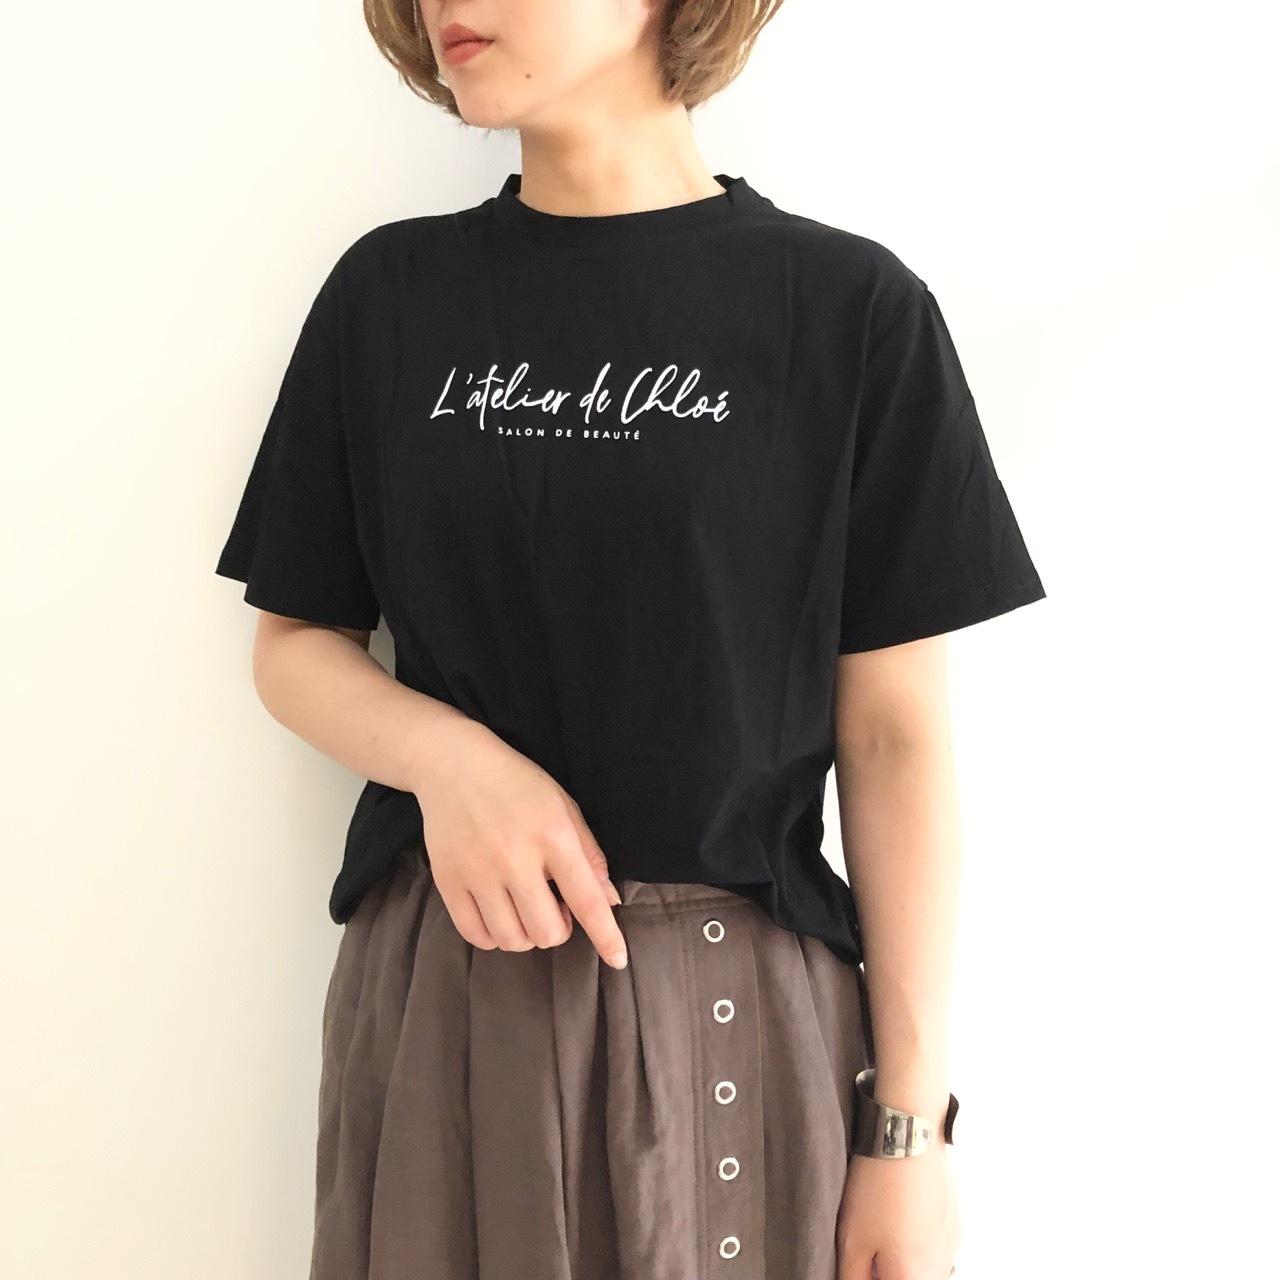 【 ROSIEE 】- 152705 - プリントTeeシャツ